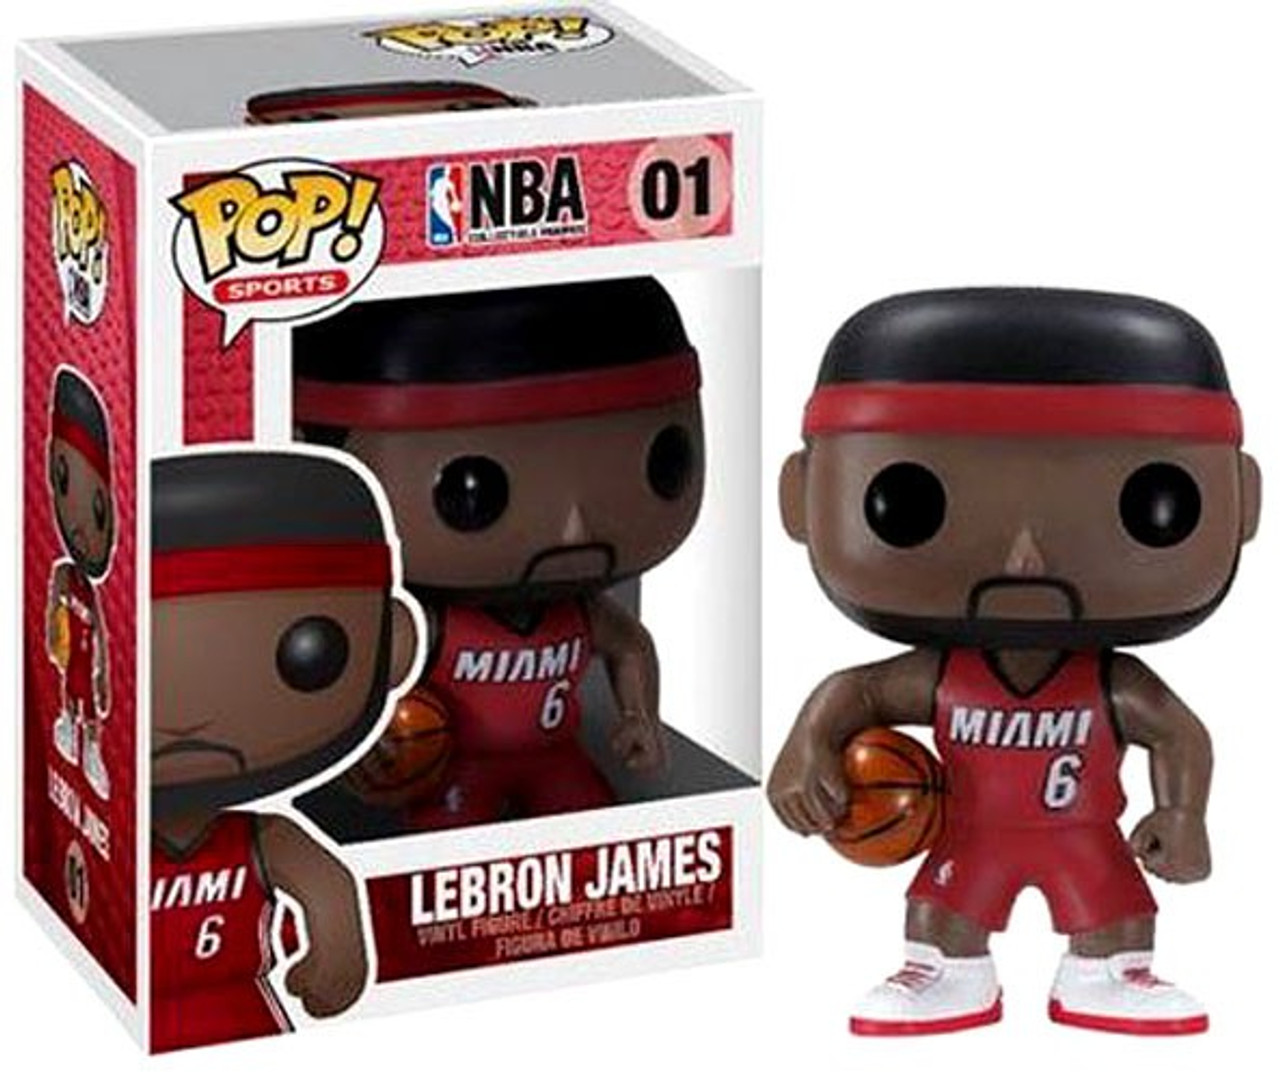 Funko NBA Miami Heat Funko POP Sports LeBron James Vinyl Figure 01 Red  Uniform 9180cd880